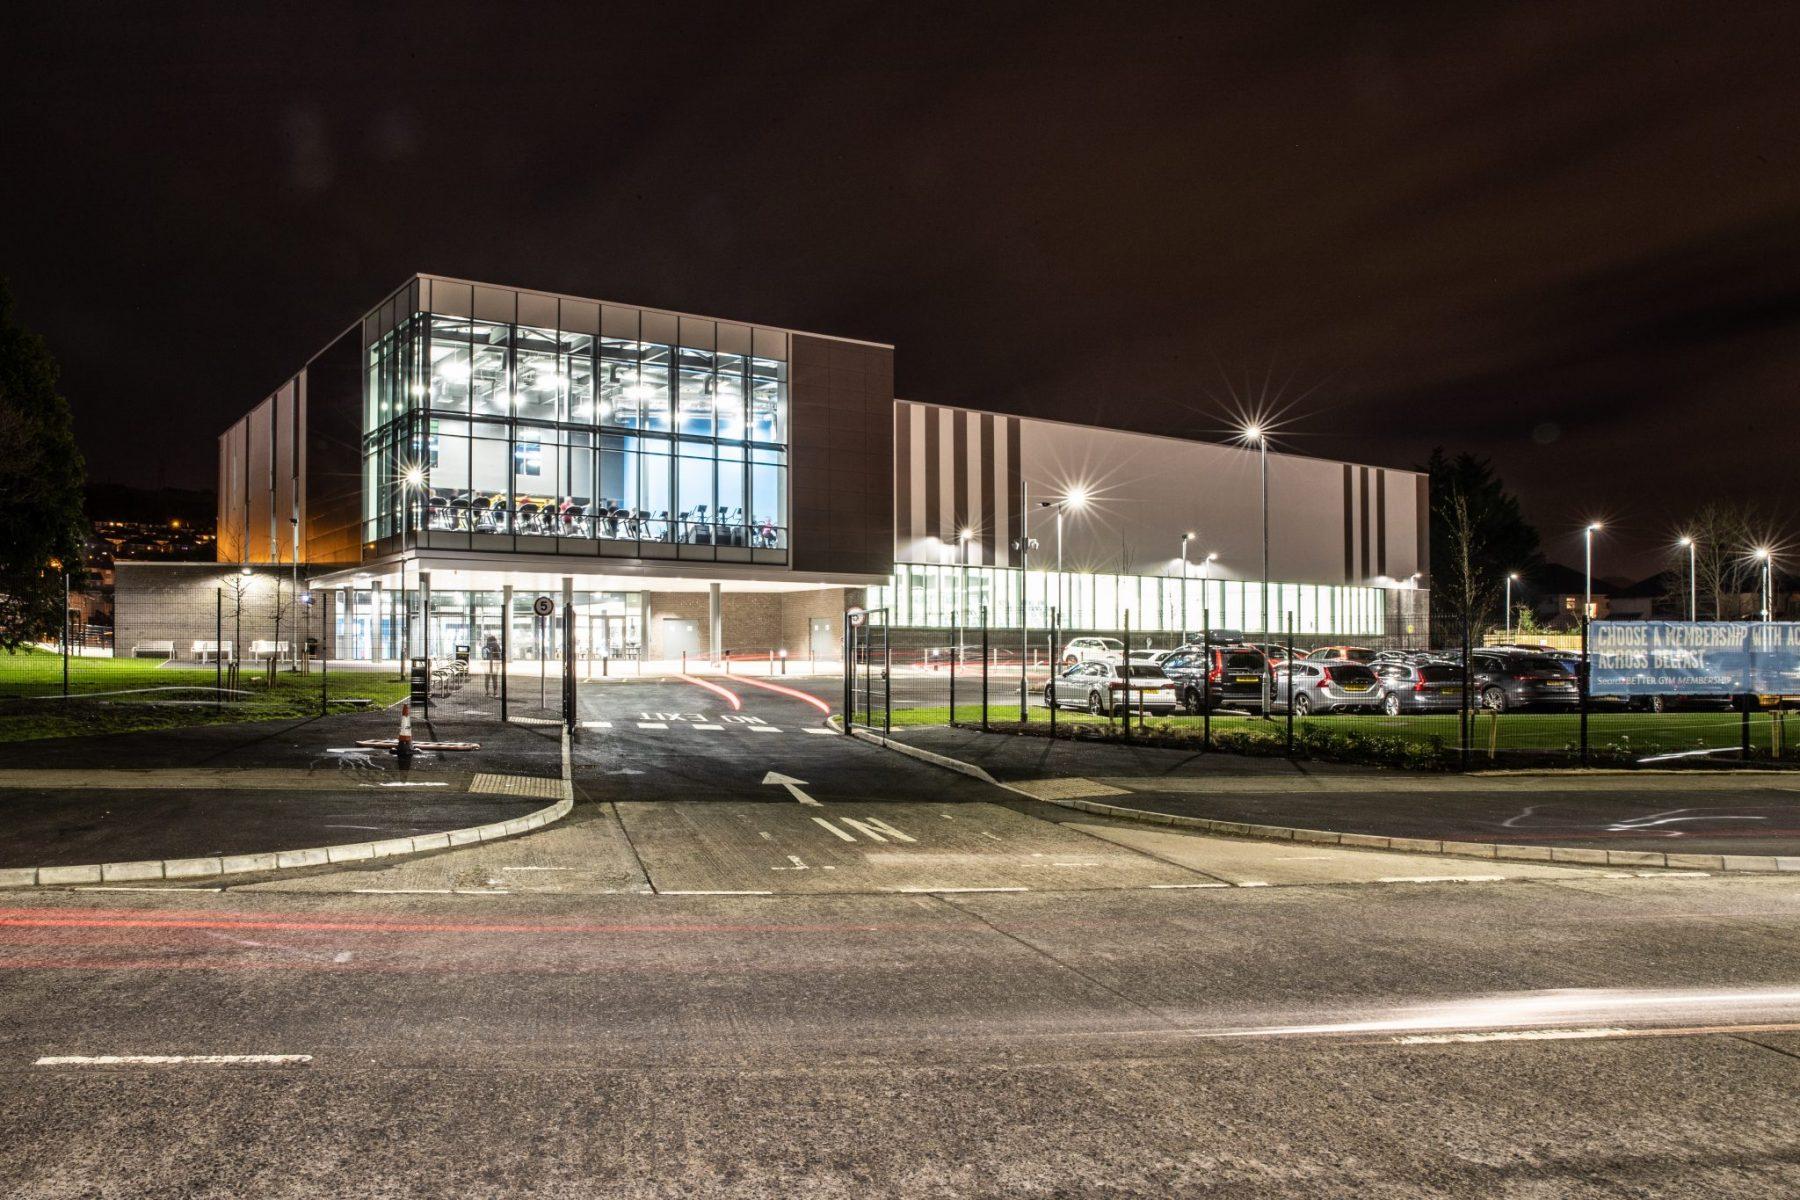 Lisnasharragh Leisure Centre